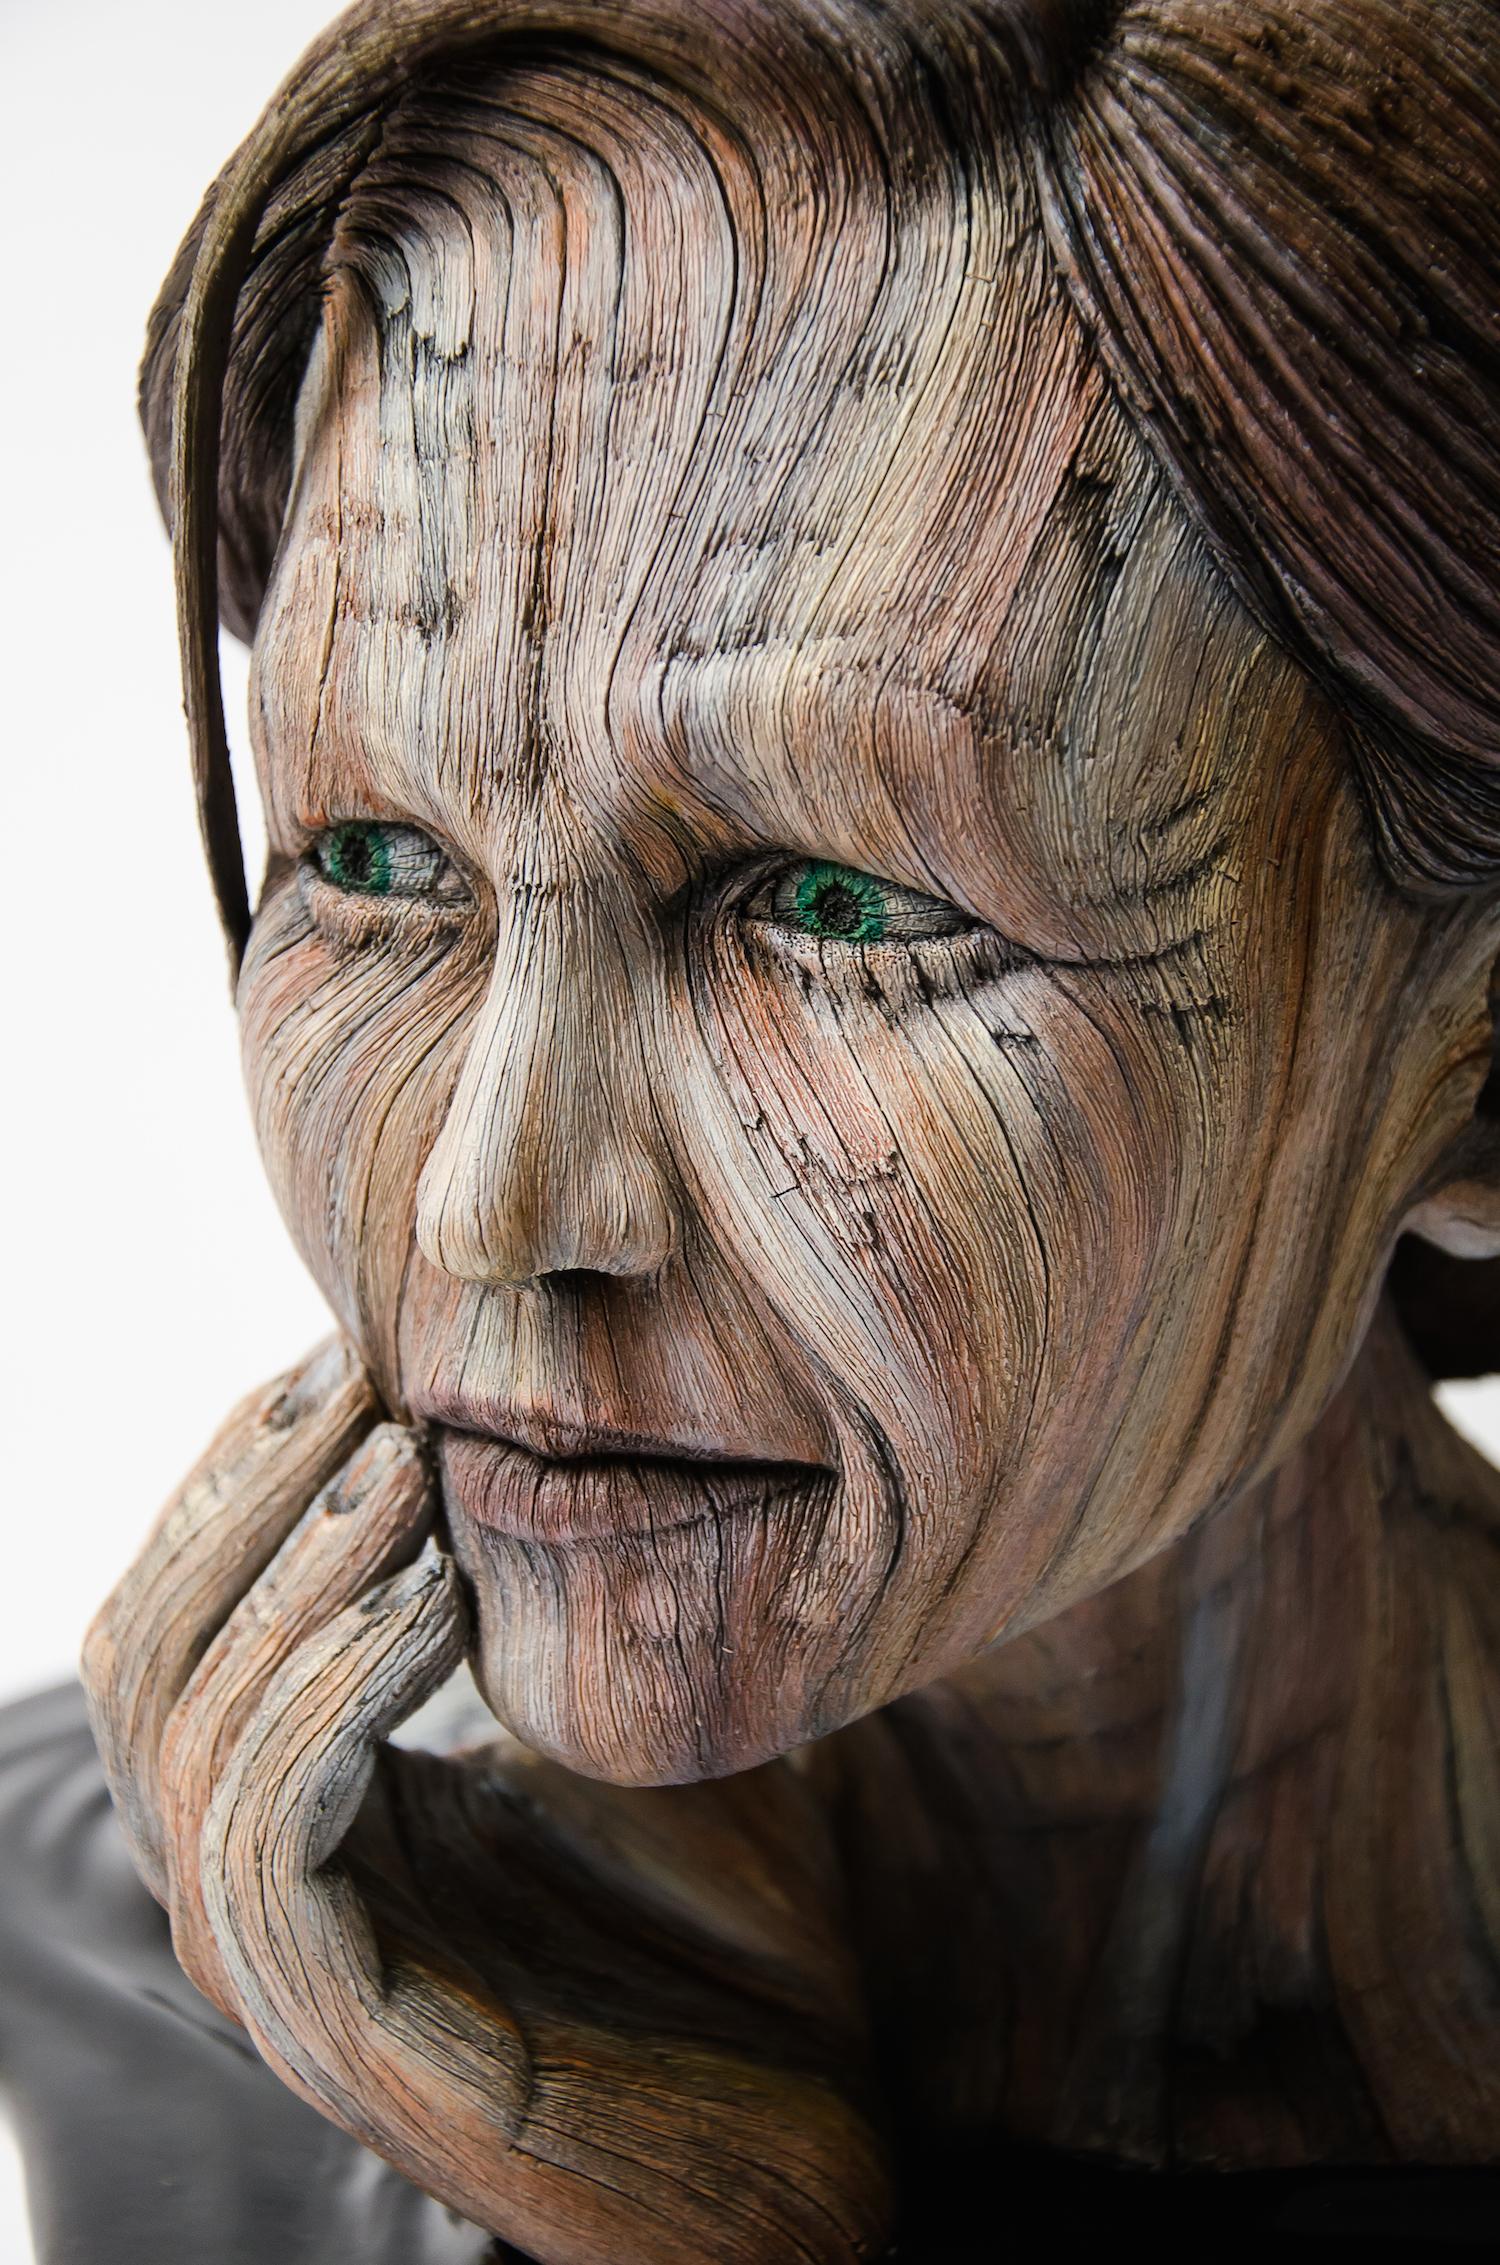 Hyperrealistic Sculptures Make Clay Look Like Wooden Humans - Creators